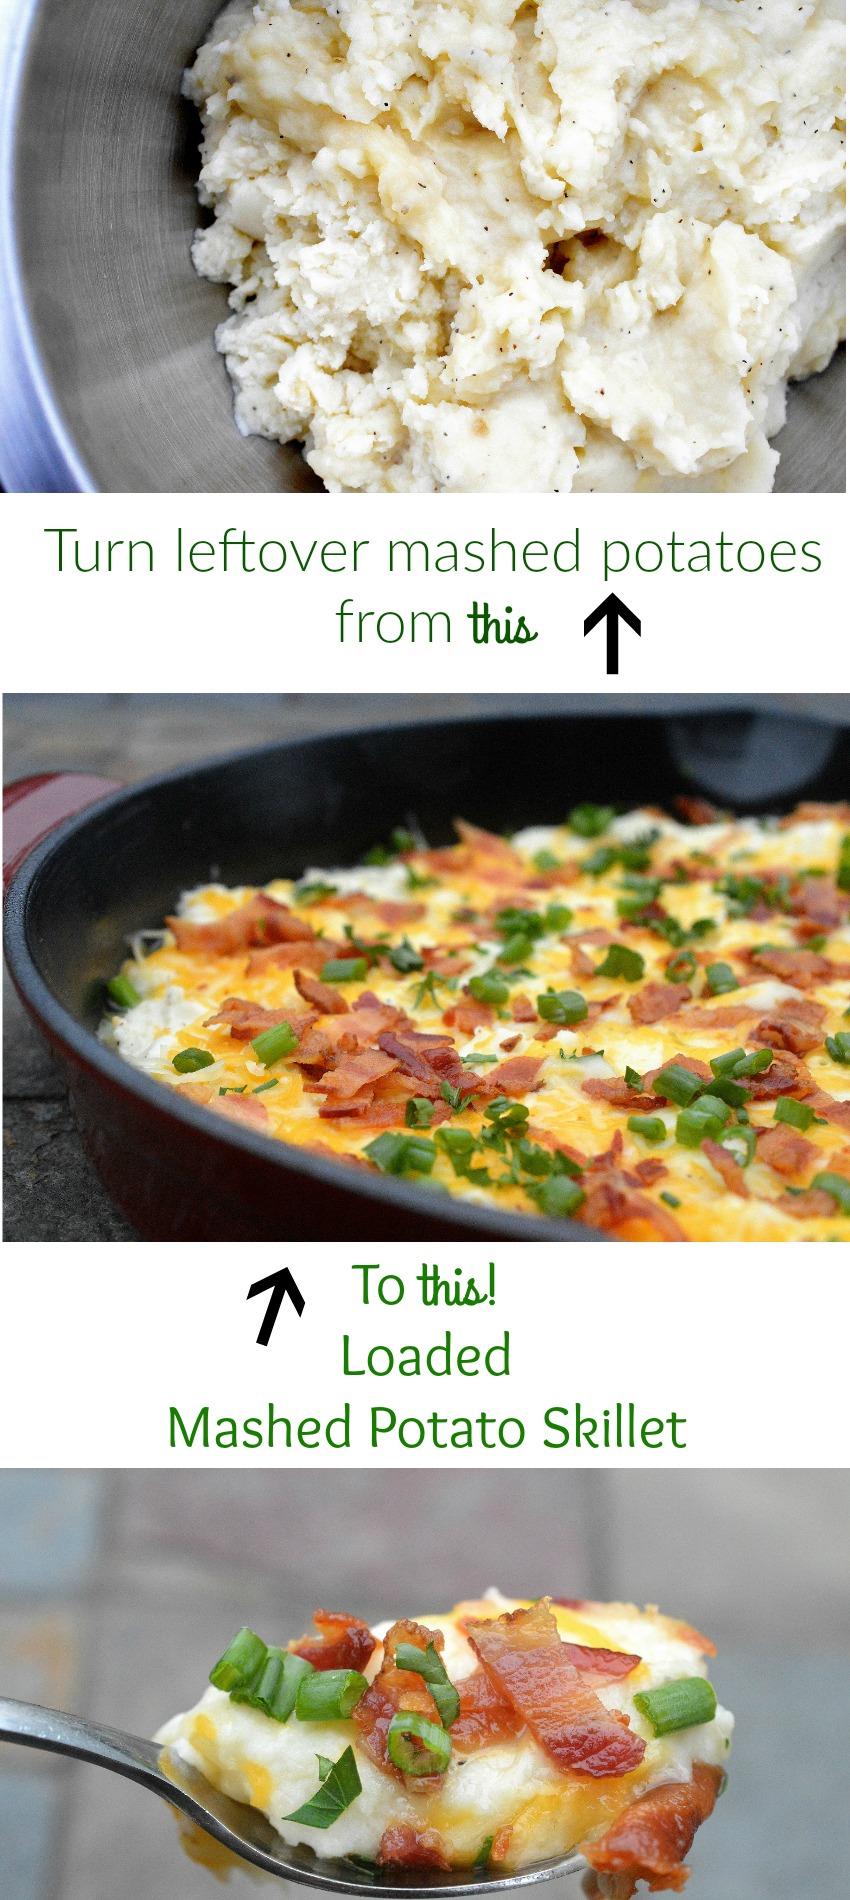 Loaded Mashed Potato Skillet - The BEST use for leftover mashed potatoes!